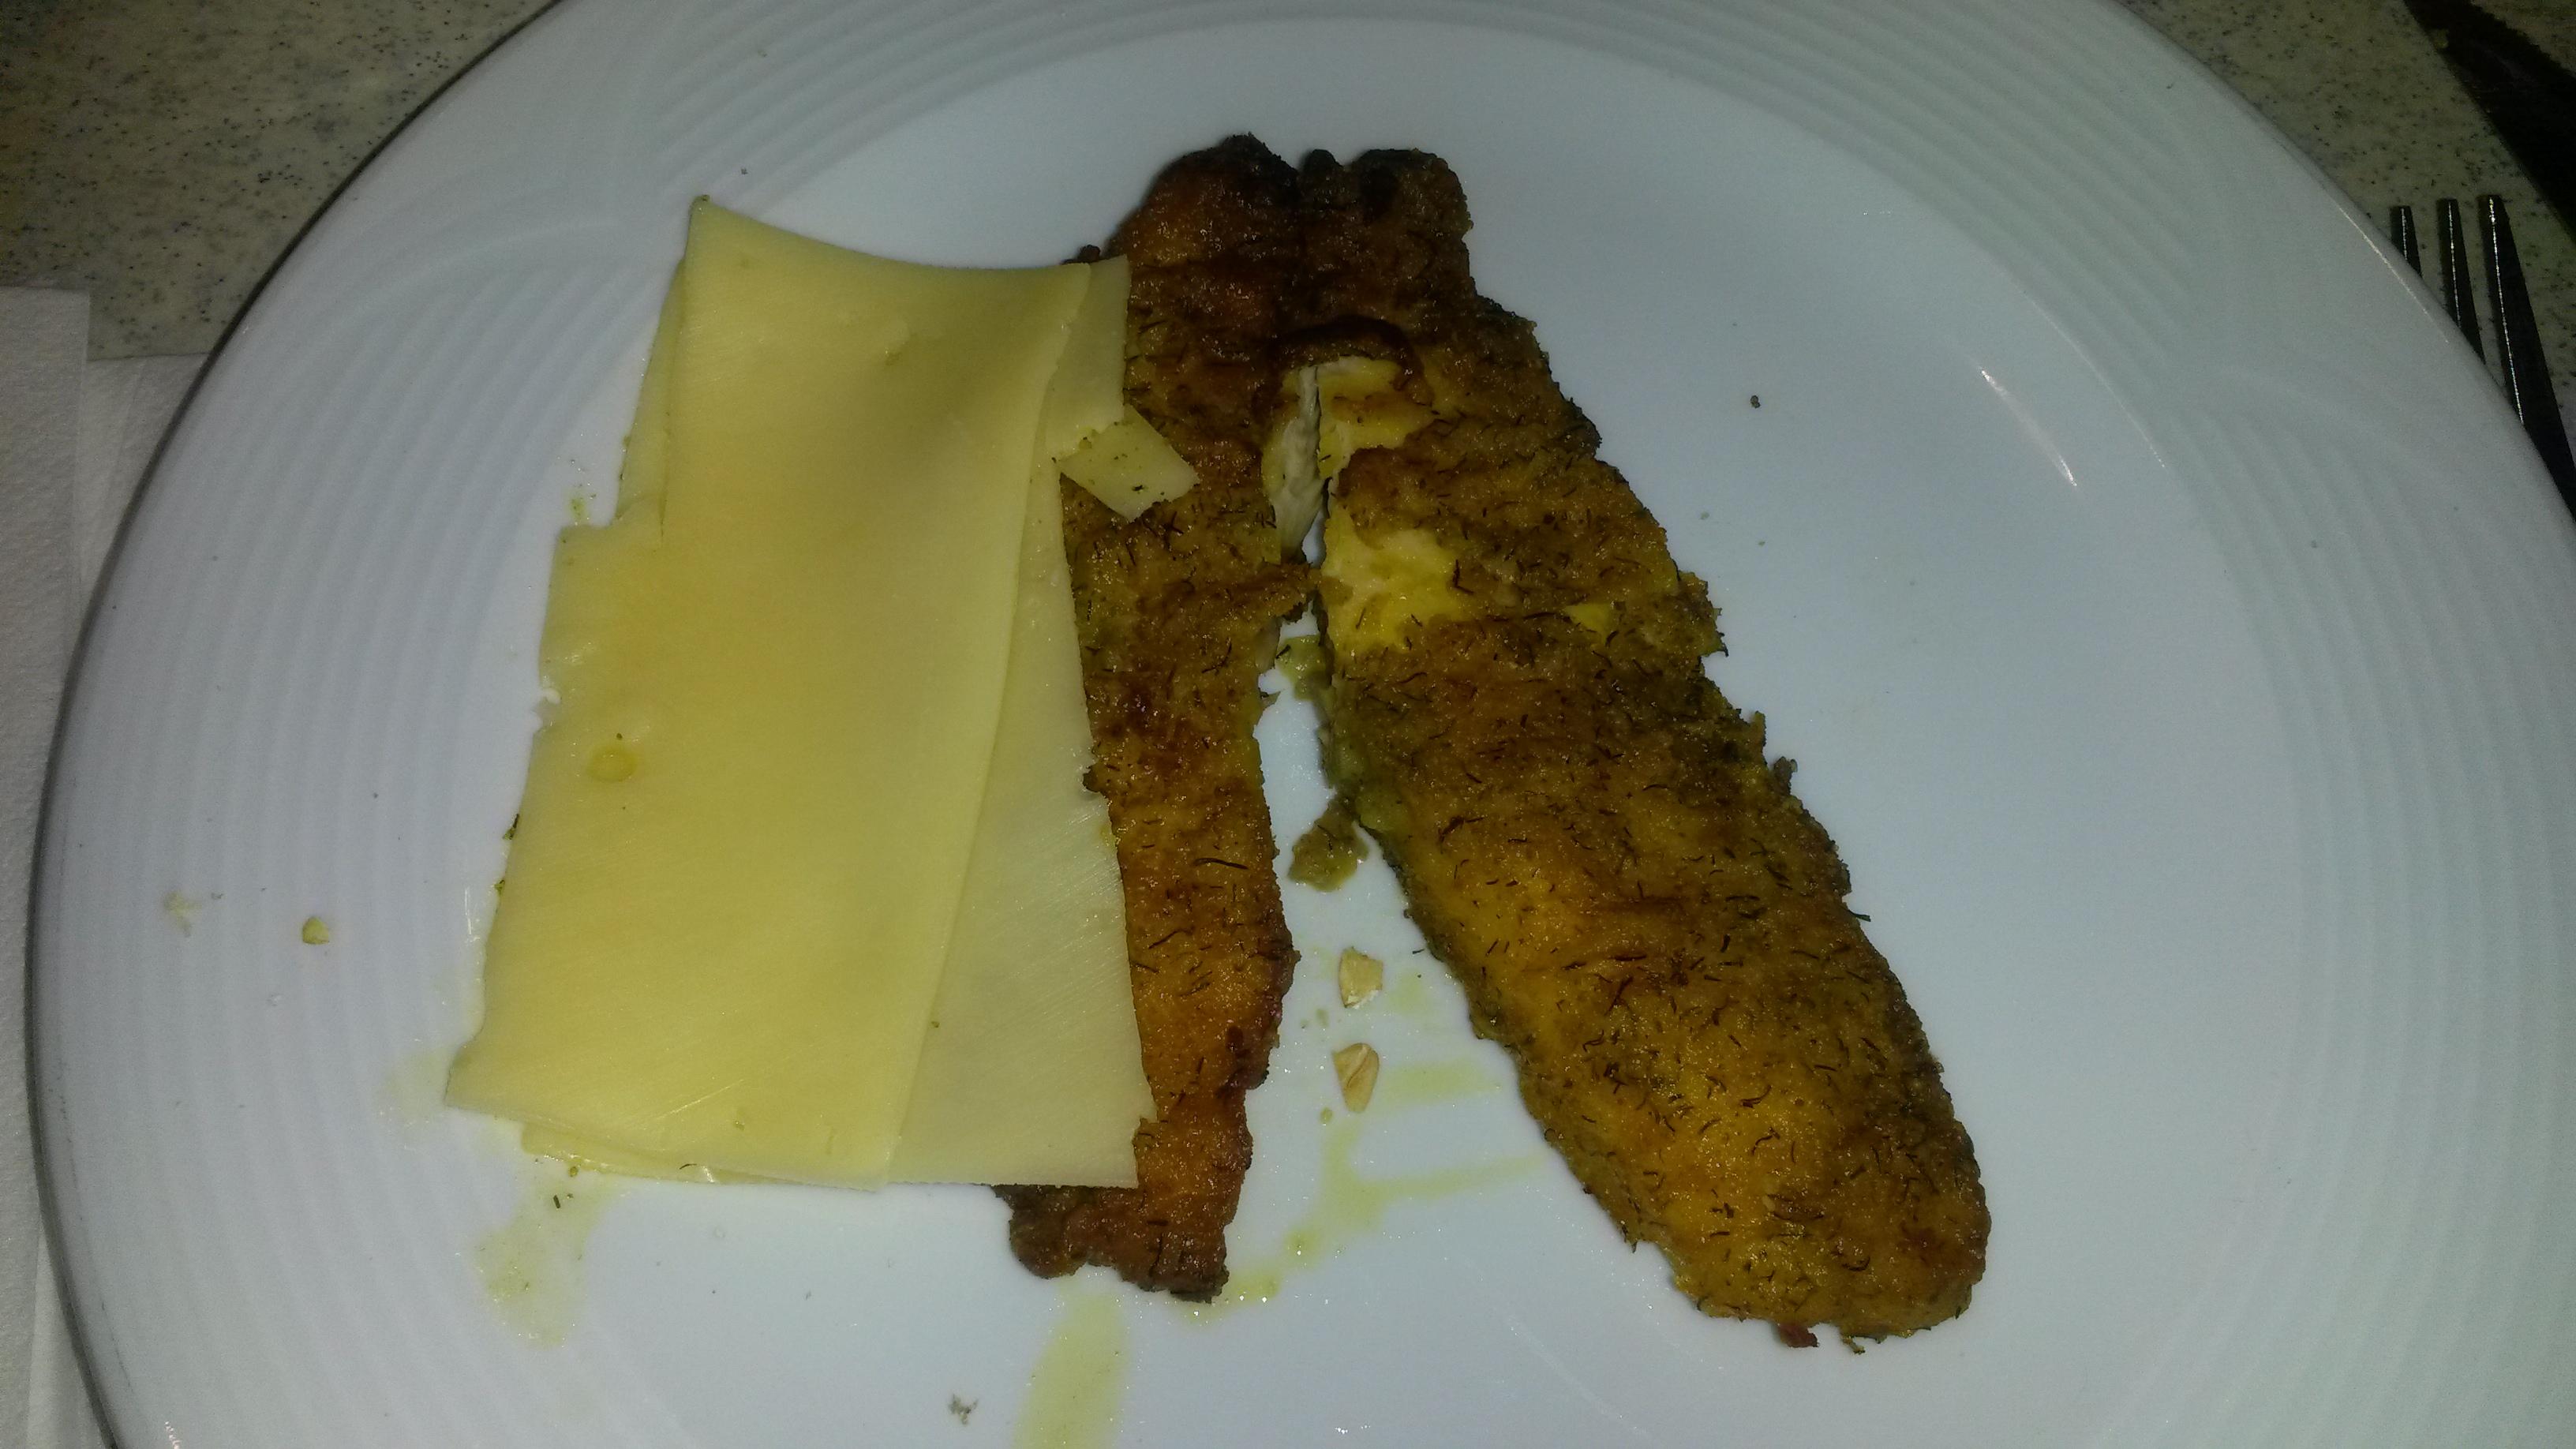 http://foodloader.net/sk0r_2014-05-28_Fisch_und_Kaese.jpg